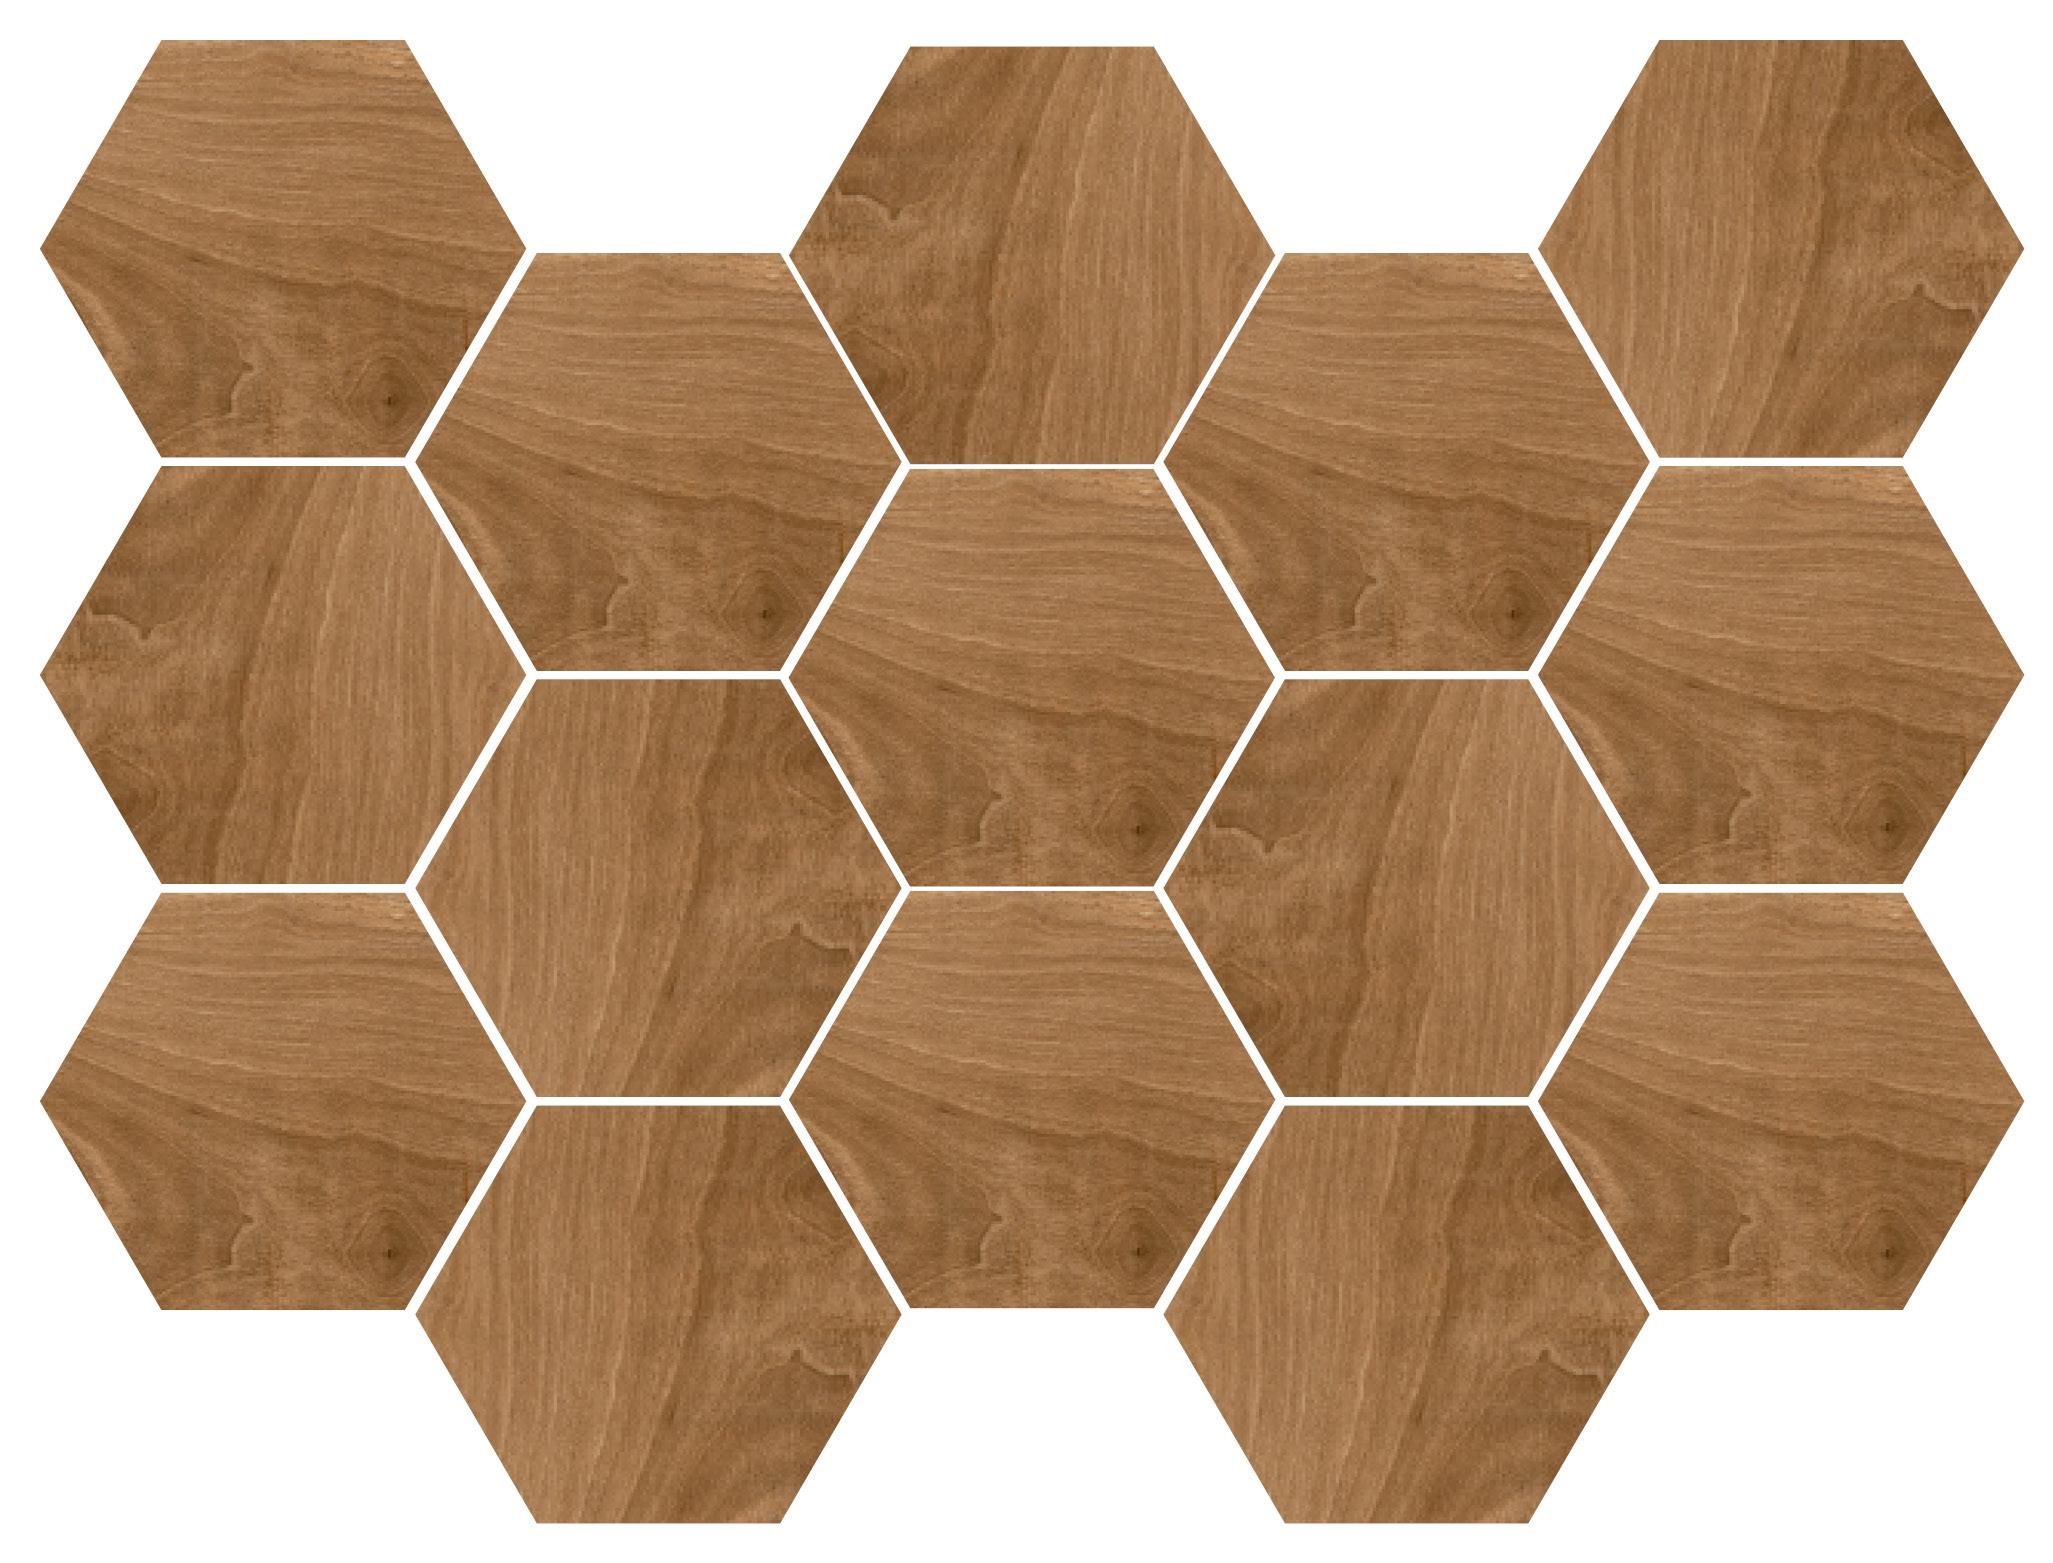 tasmania-teak-10-x-14-hexagon-mosaic-happy-floors-1.jpg